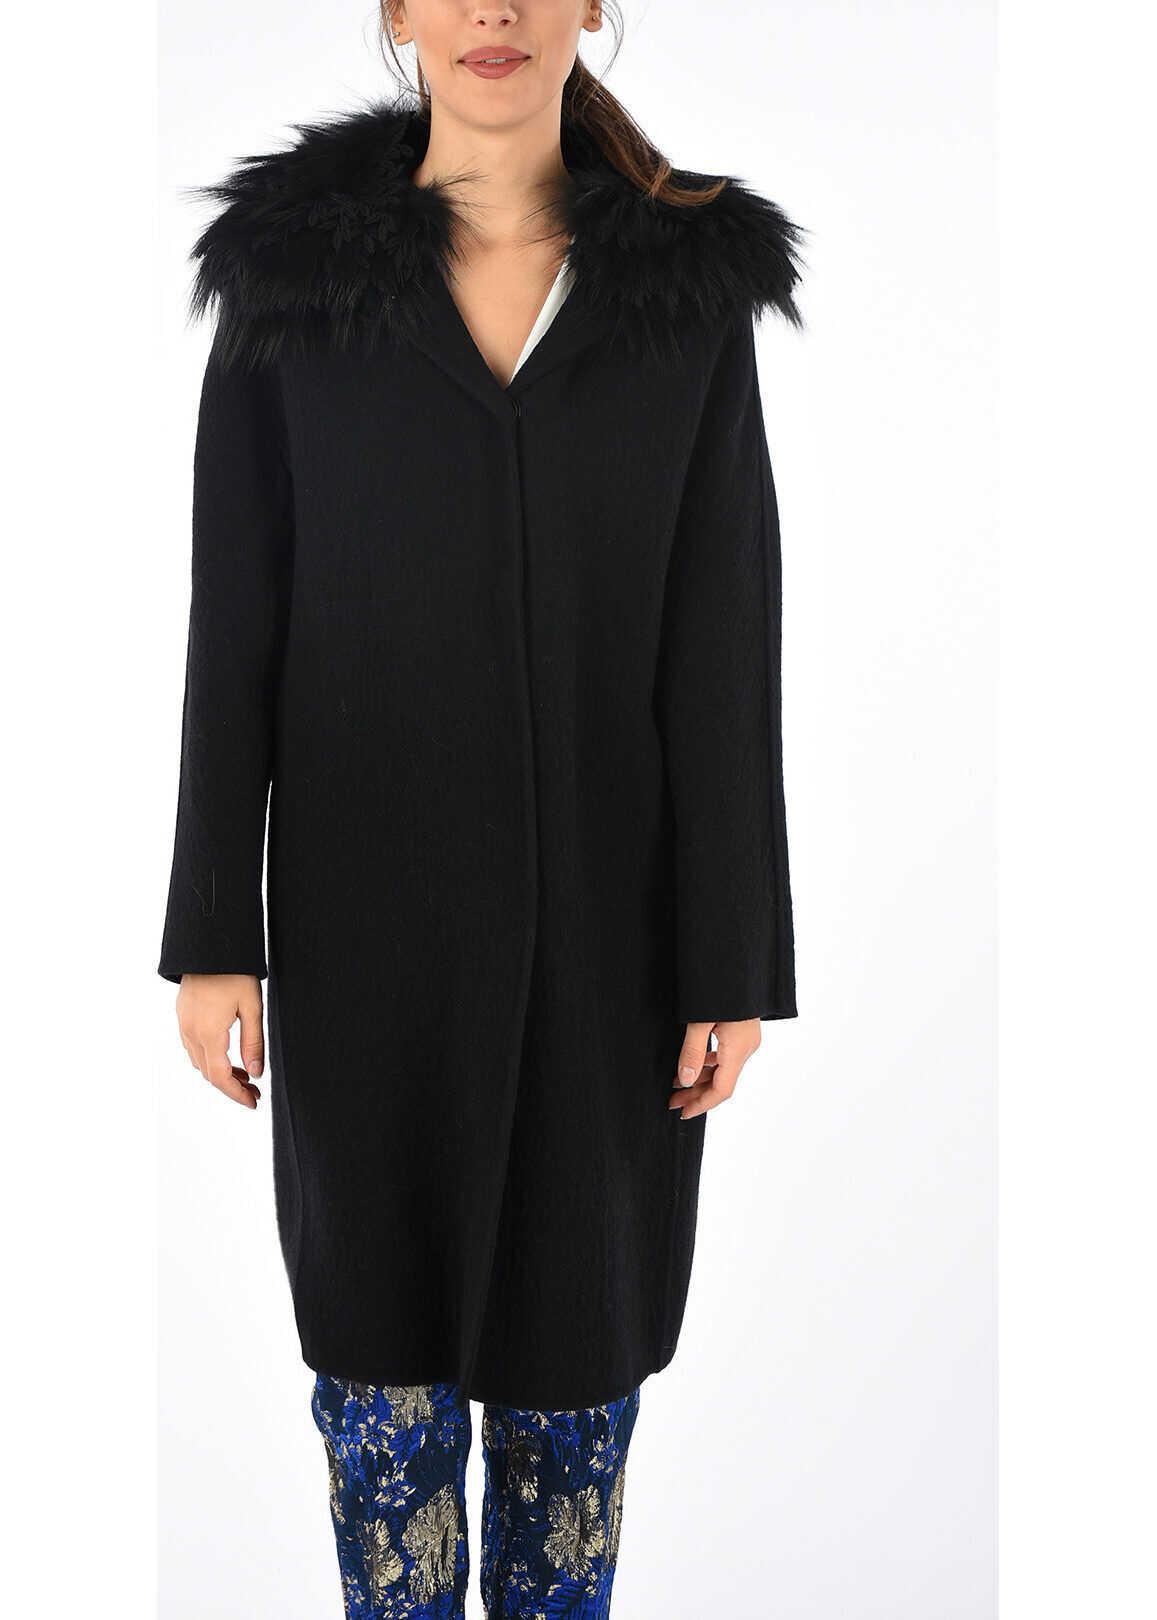 Real Fur Details Coat